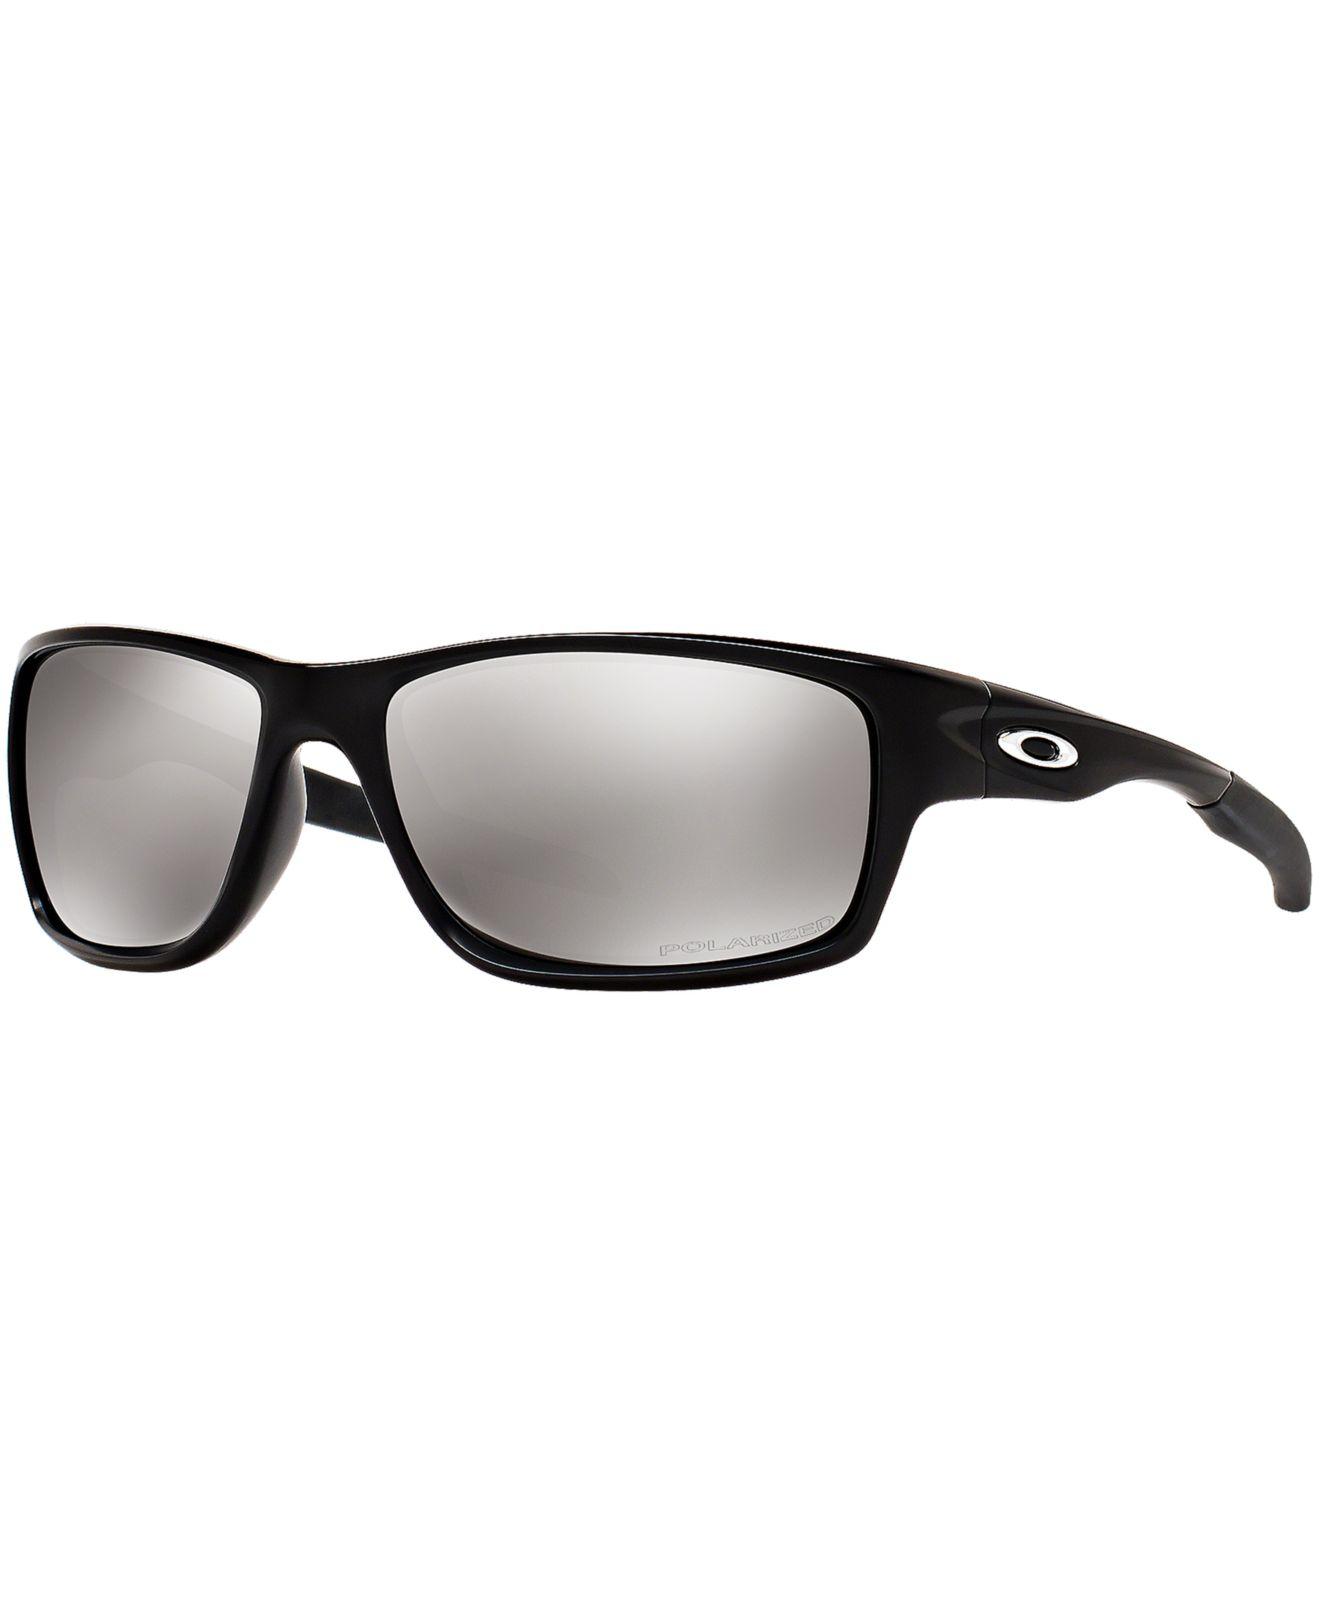 149a6cd3b0 Oakley Canteen Sunglasses 009225 « Heritage Malta